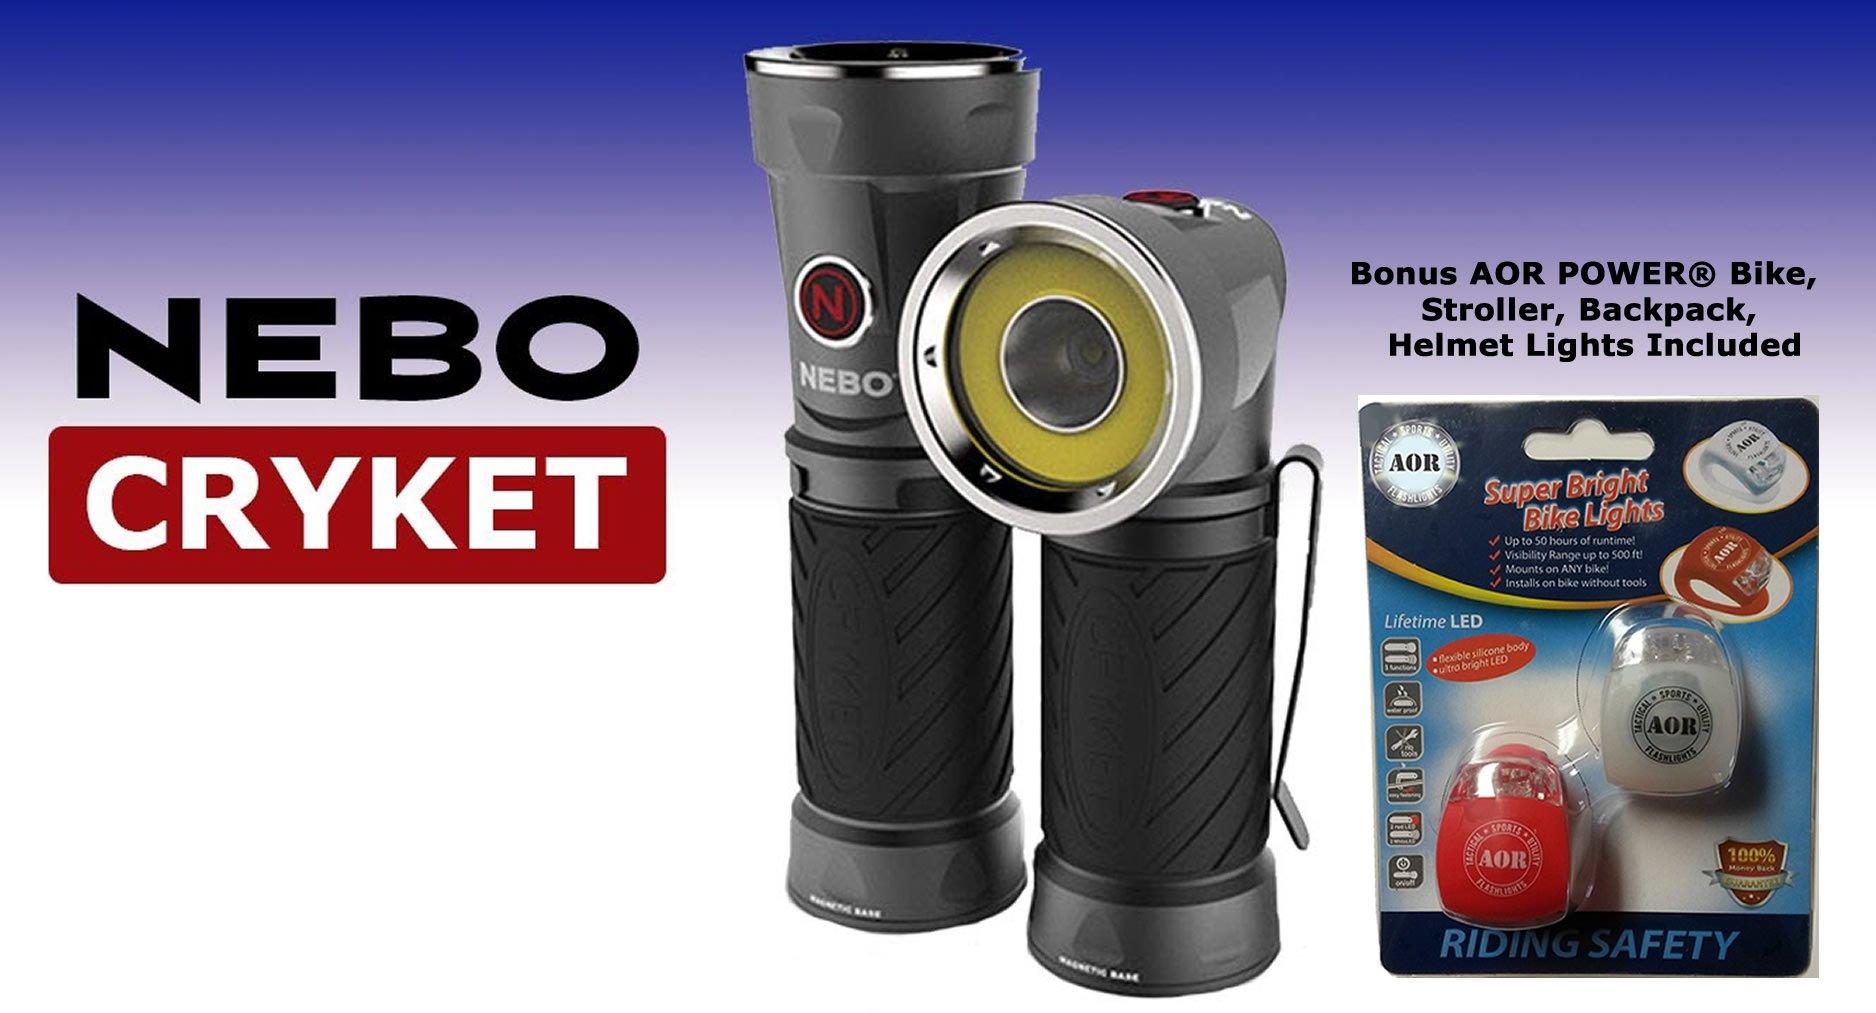 Nebo Cryket 6437 LED 250 Lumen Work Light, Spot Light and Red LED. 9 Position Swivel Head. AOR6437 Bundle includes 3 AA Batteries, and AOR POWER Bike, Stroller, Backpack, Helmet Lights …